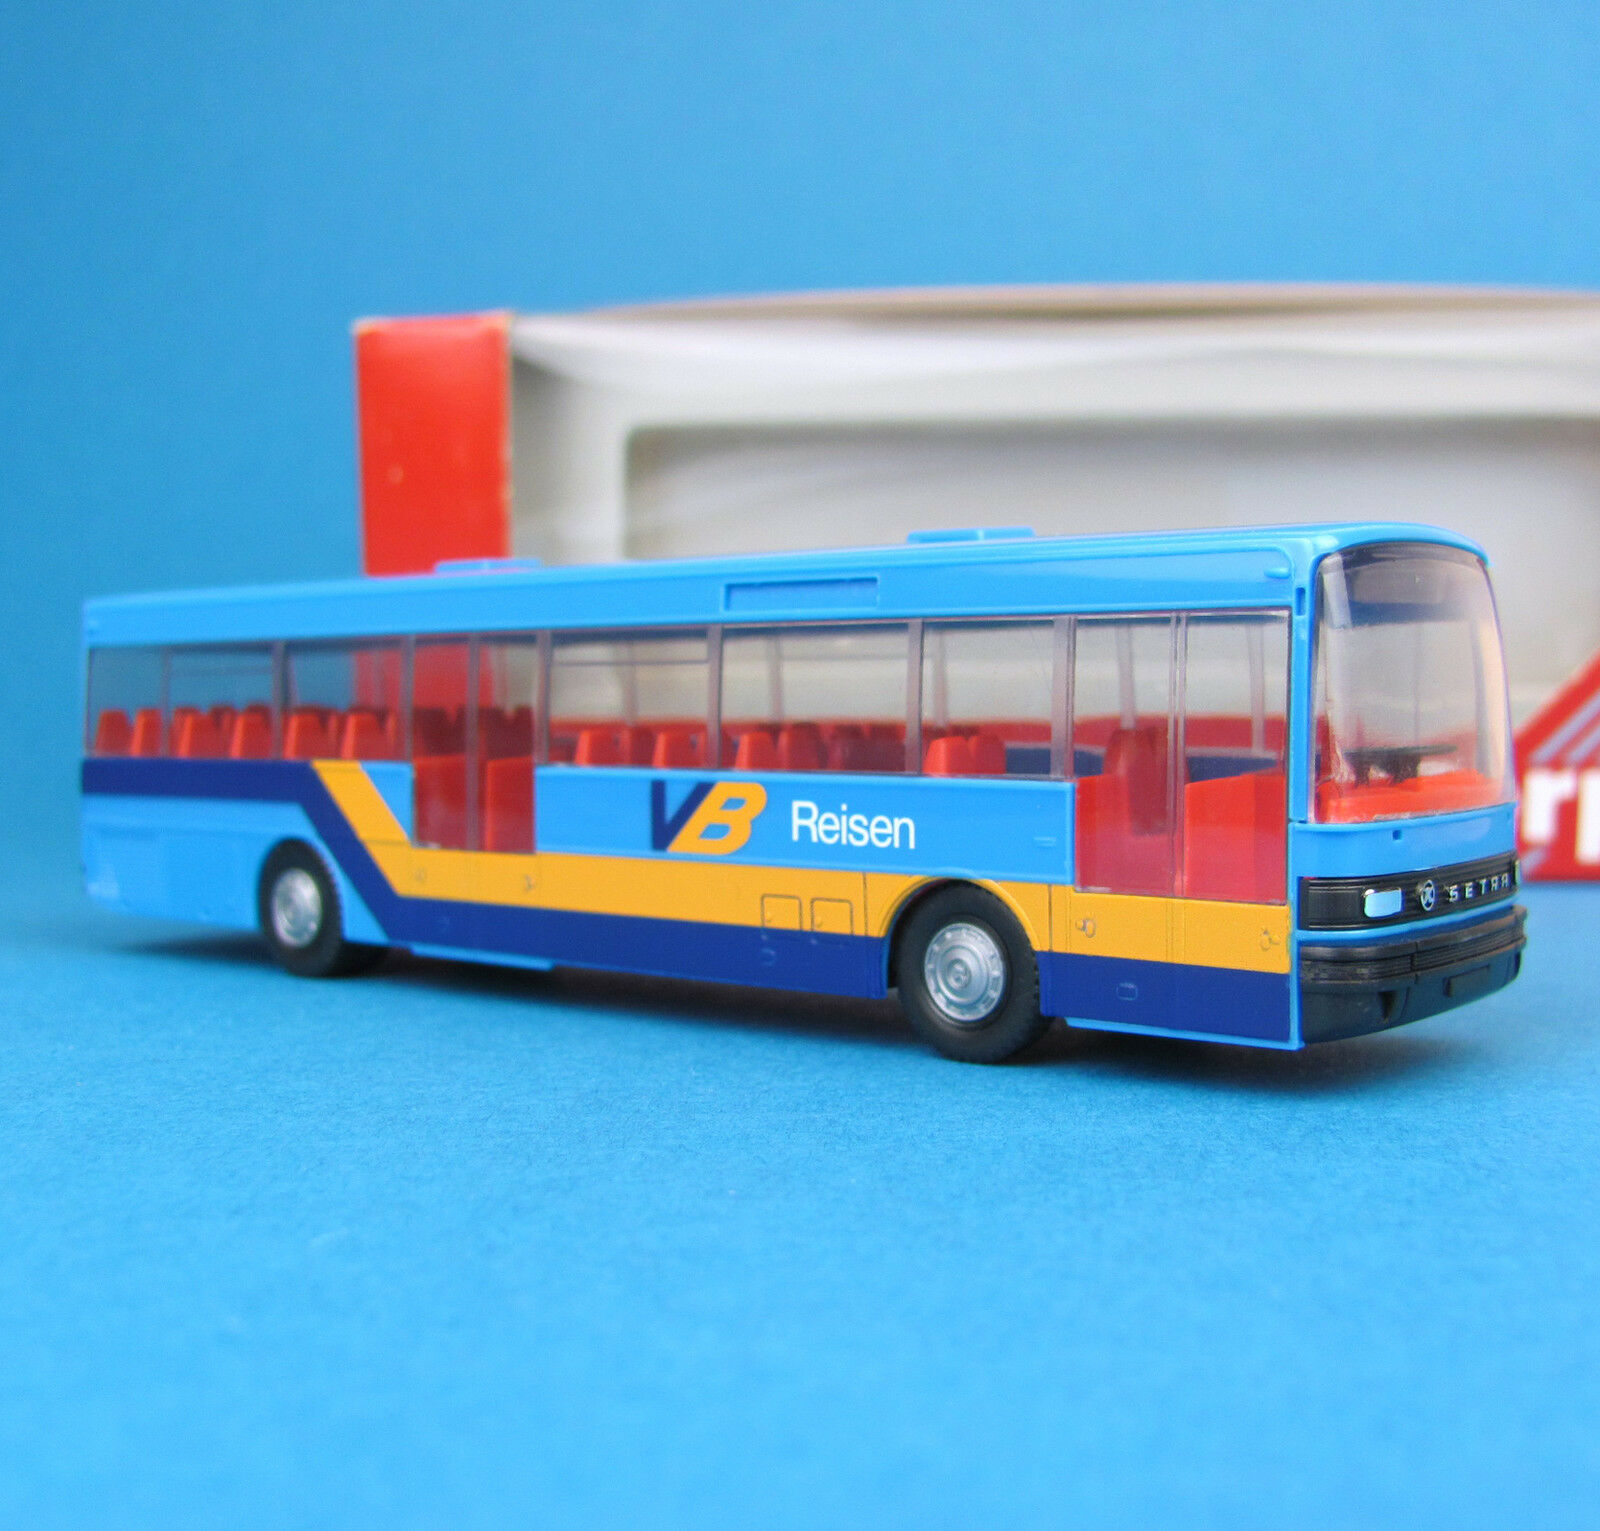 Herpa h0 Setra S 215 HD Bus VB voyages Neratovice manœuvrable bleu neuf dans sa boîte HO 1 87